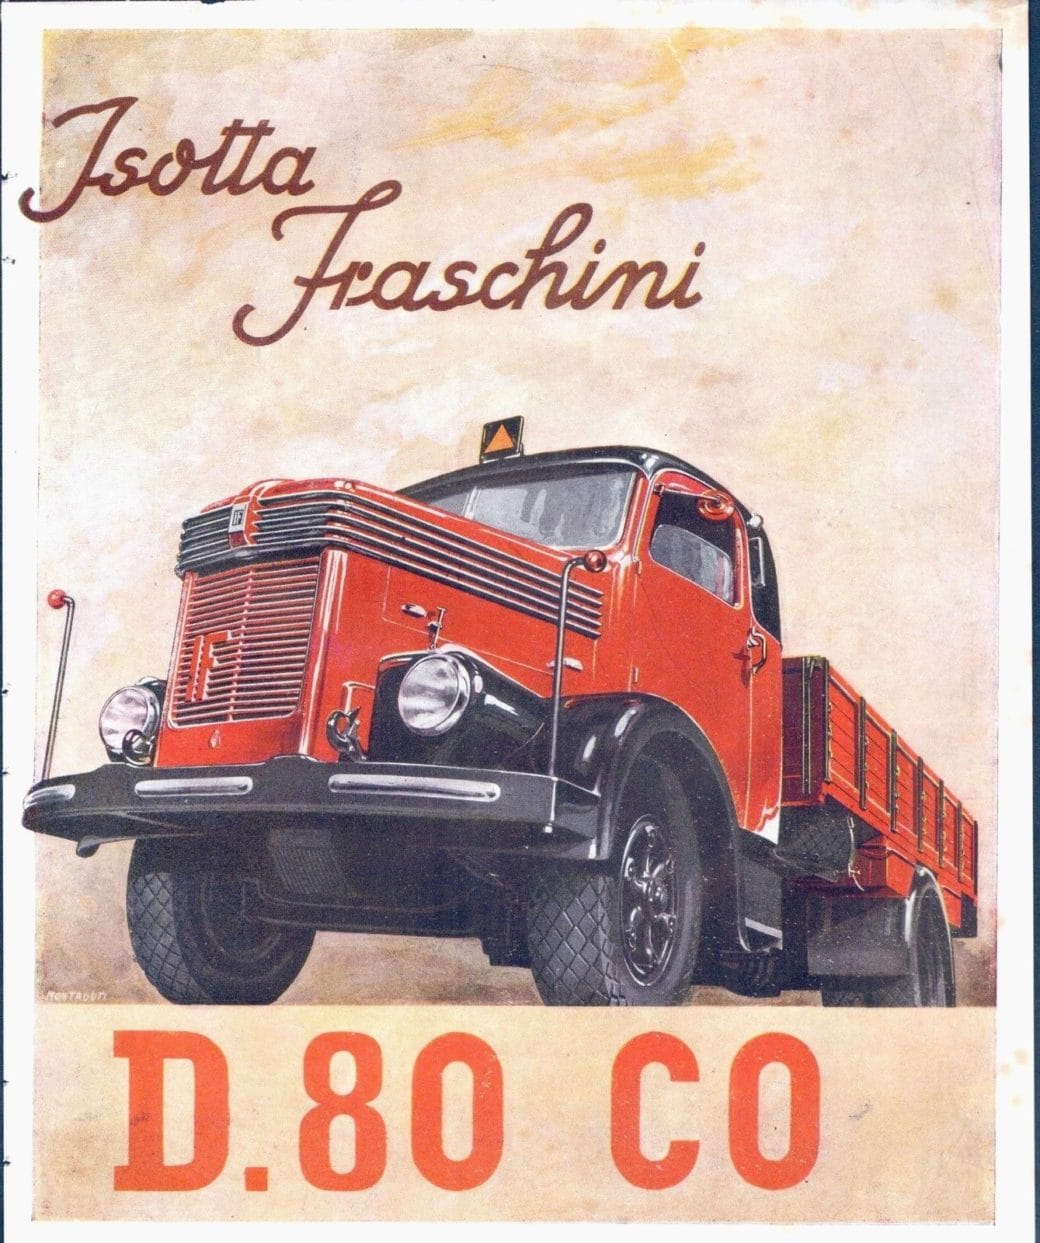 ISOTTA-FRASCHINI-1934-1955-D65-D90-D-80-met-MAN-Licentie--diesel-(1)